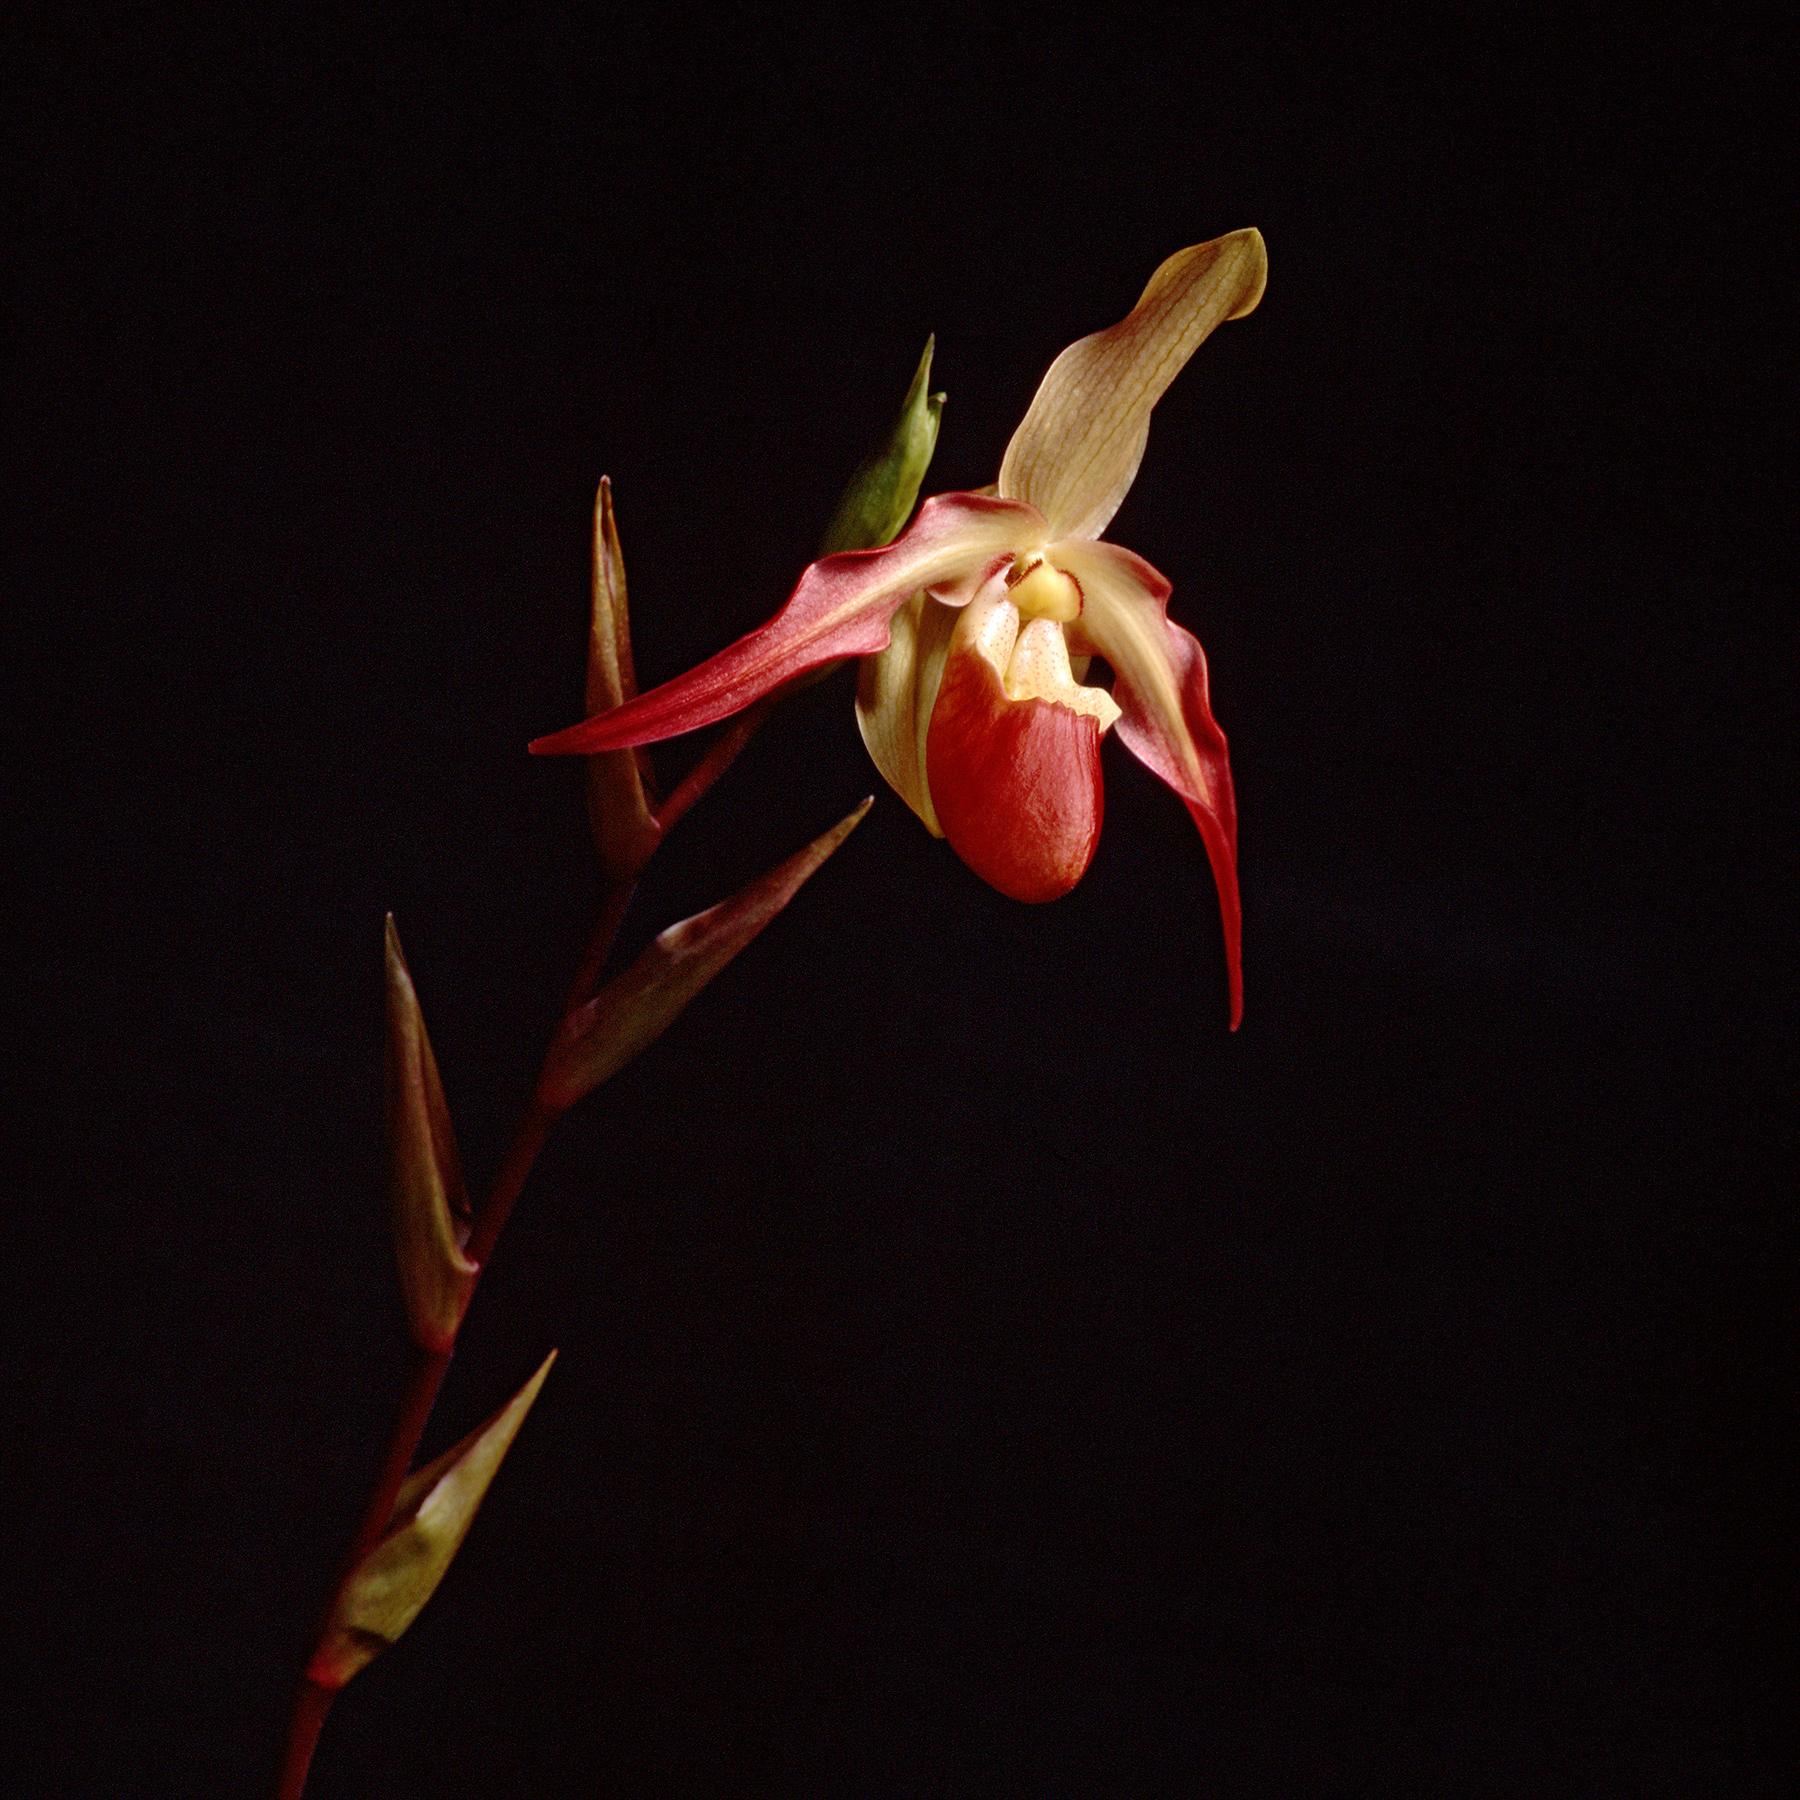 Lady Slipper | Bronica SQA | 110mm lens | Fuji Provia | Howard Sandler